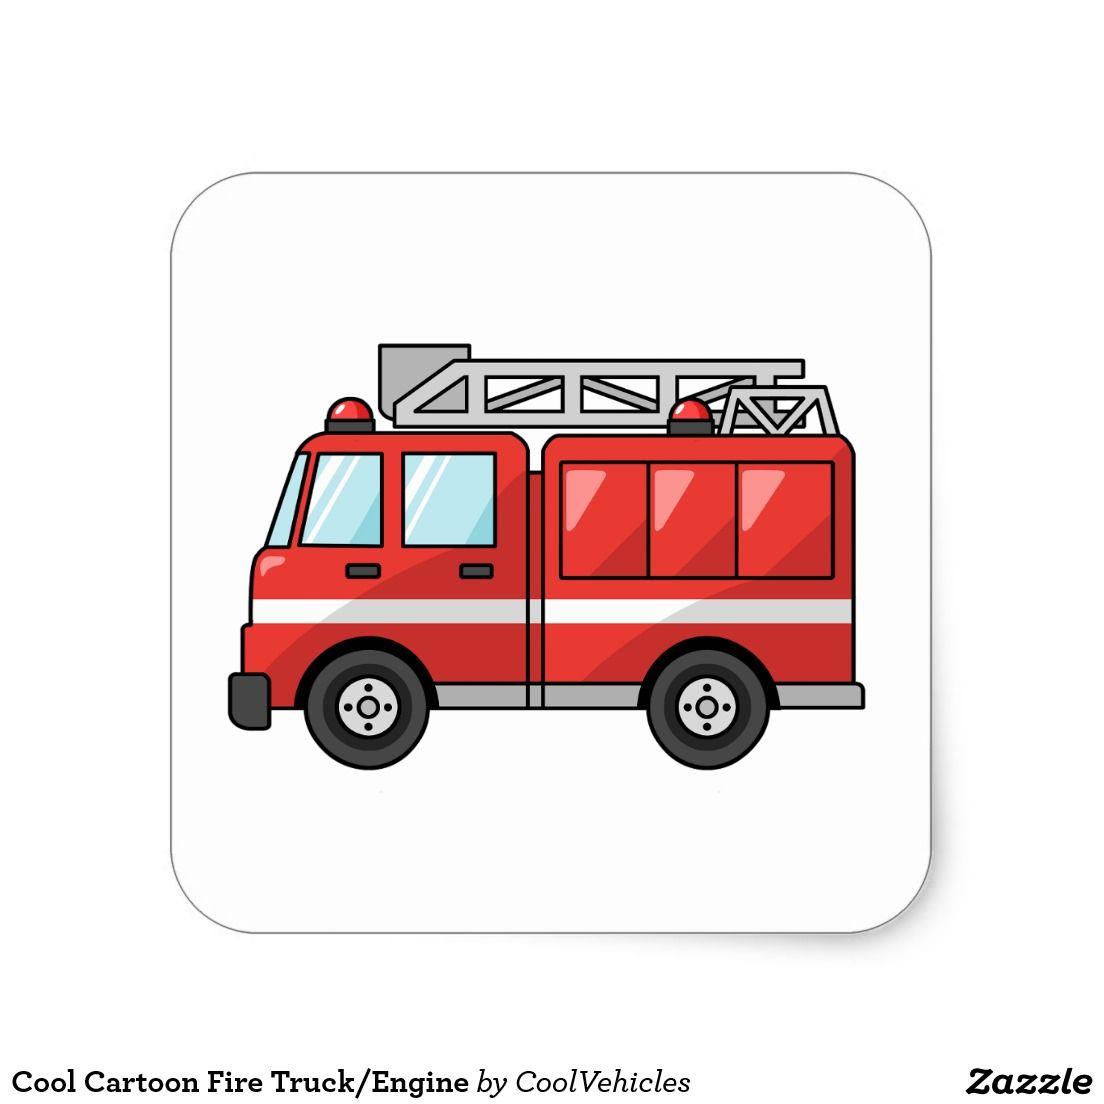 Cool Cartoon Fire Truck Engine Square Sticker Zazzle Com Fire Trucks Fire Truck Drawing Cool Cartoons